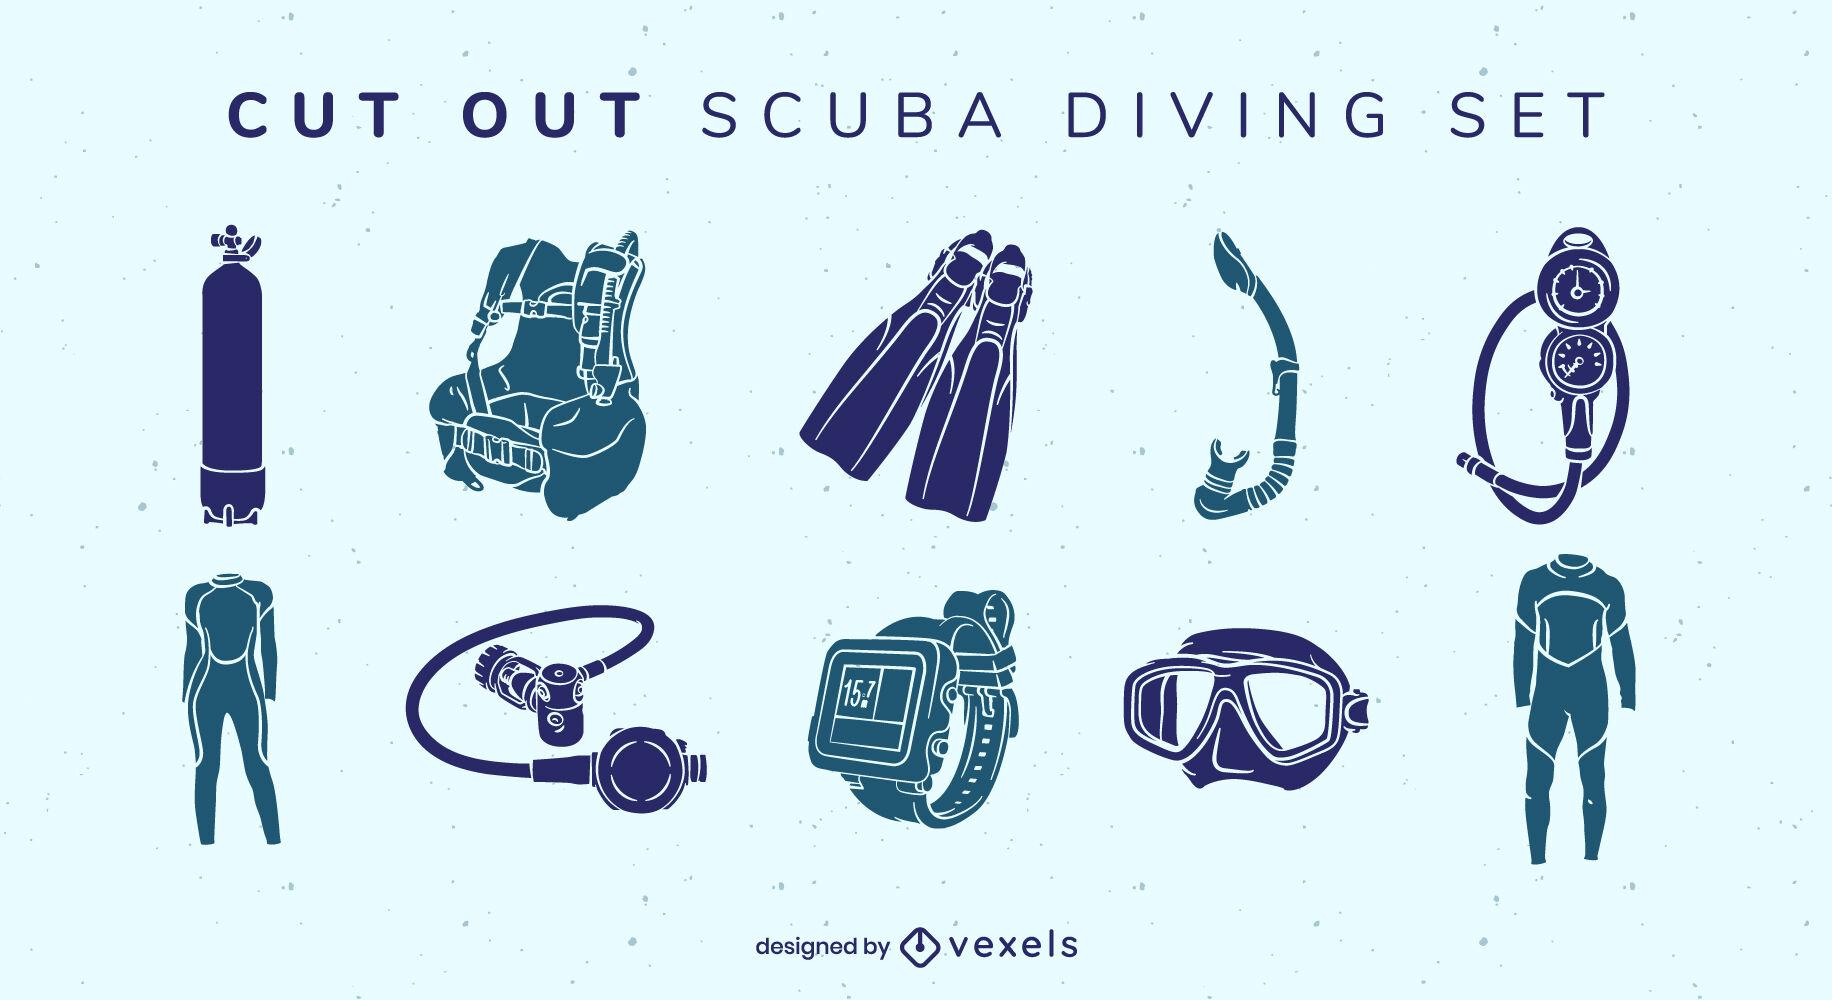 Diving equipment cut out elements